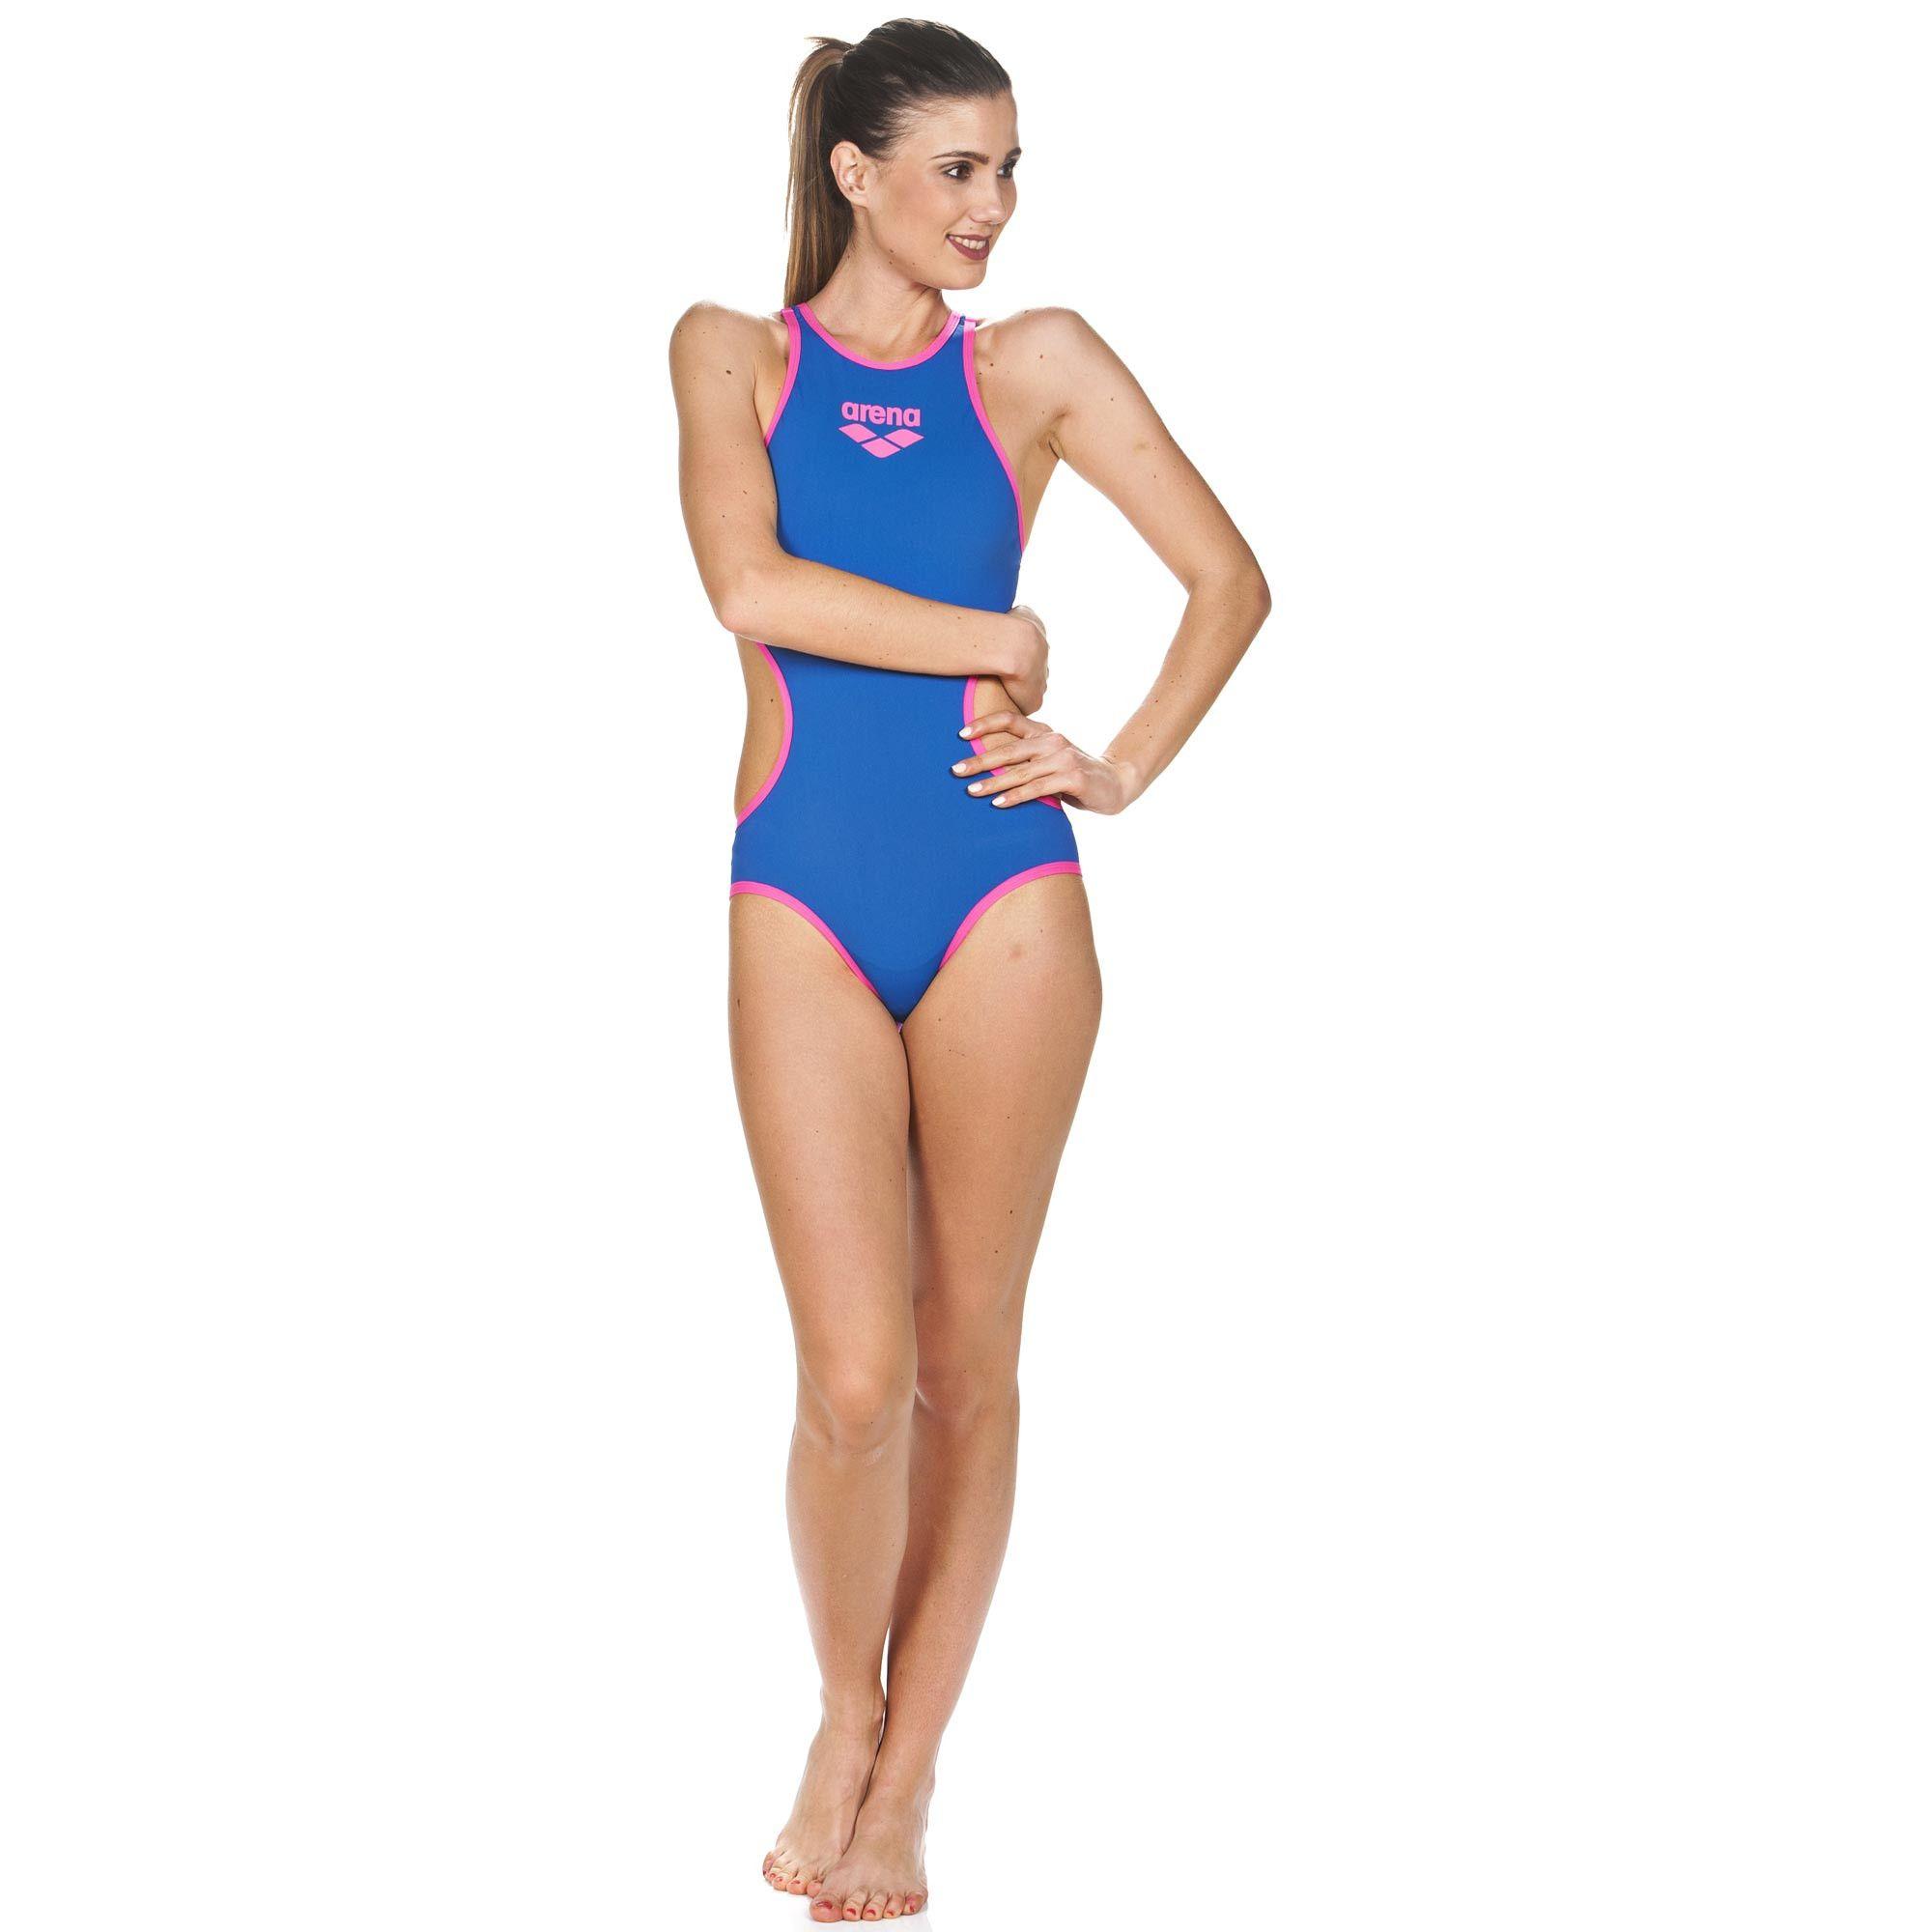 f013b826d06 Women's Arena One Biglogo One Piece Swimsuit   arena Training ...